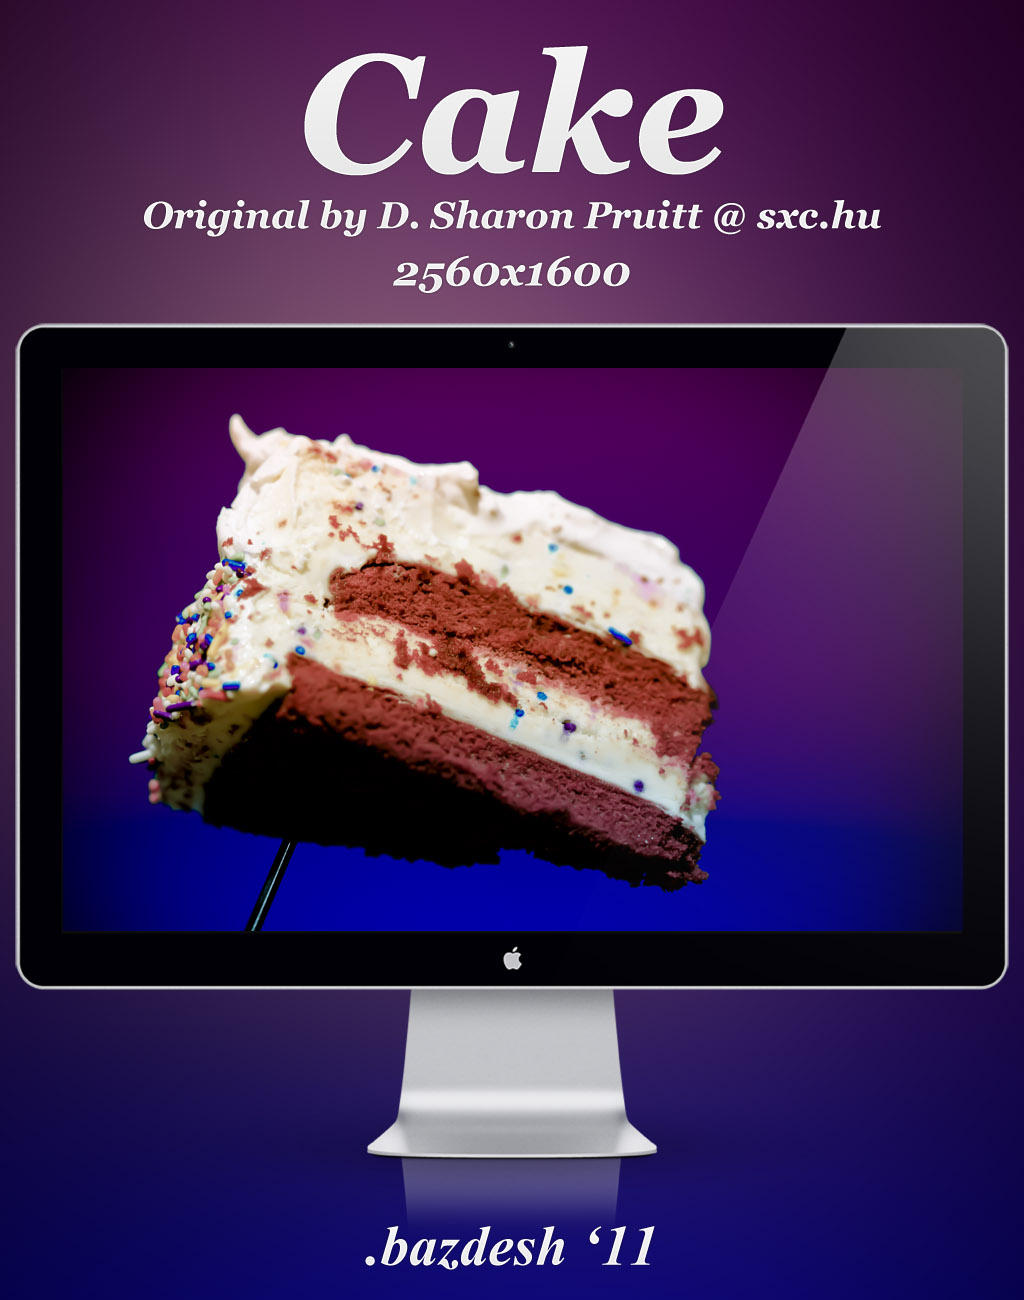 Cake by bazdesh